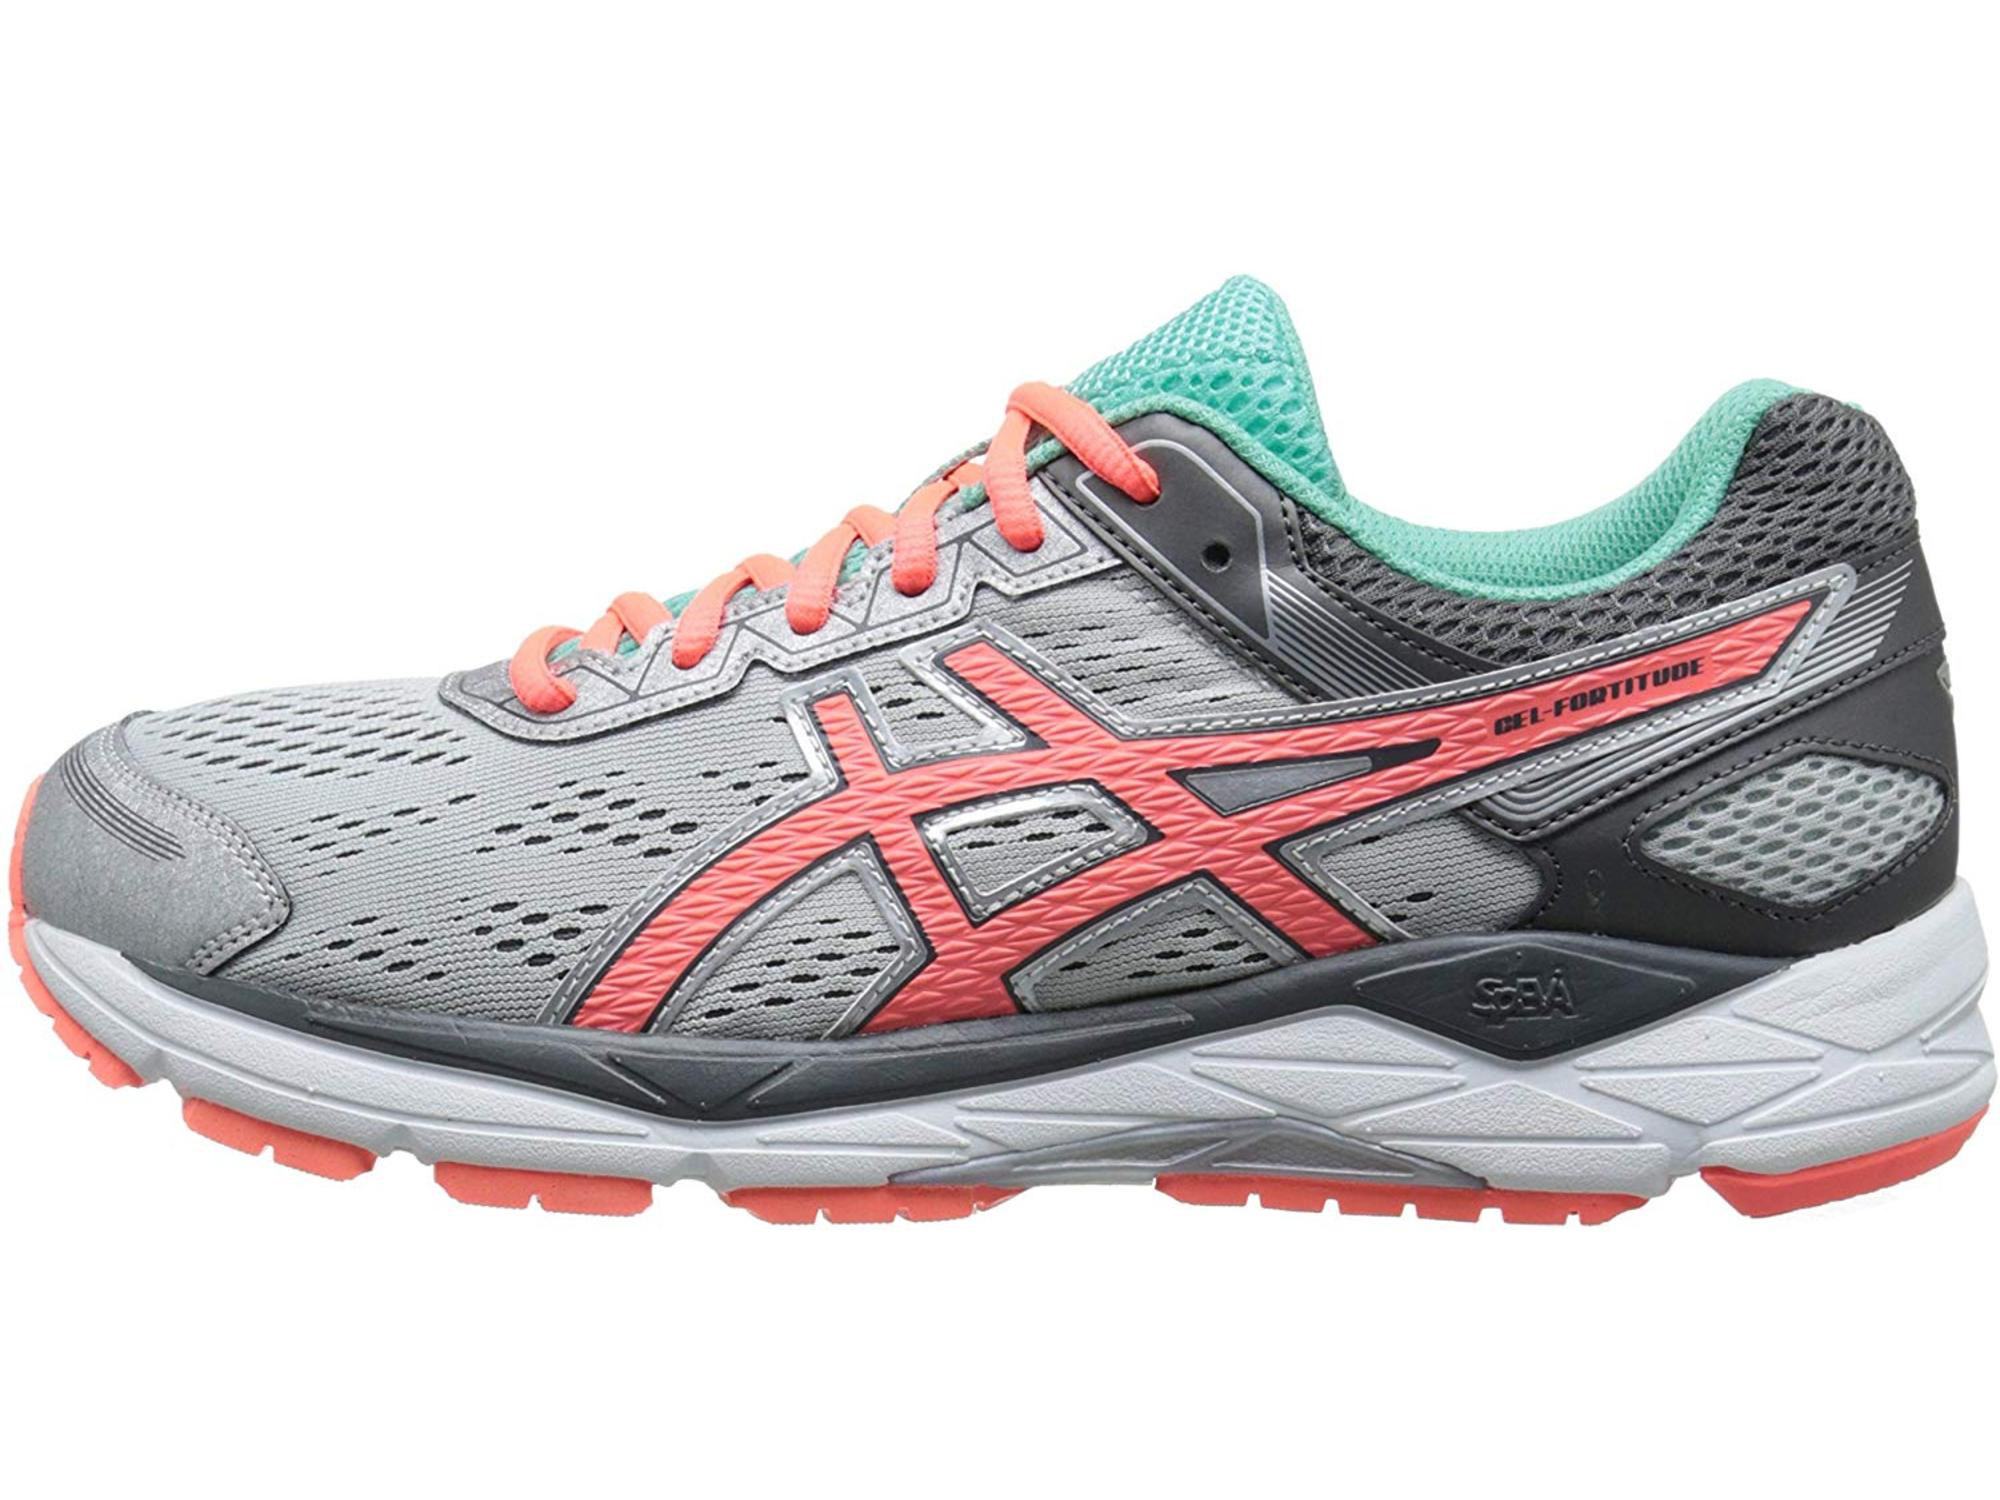 GEL Fortitude 7 Running Shoe, Silver